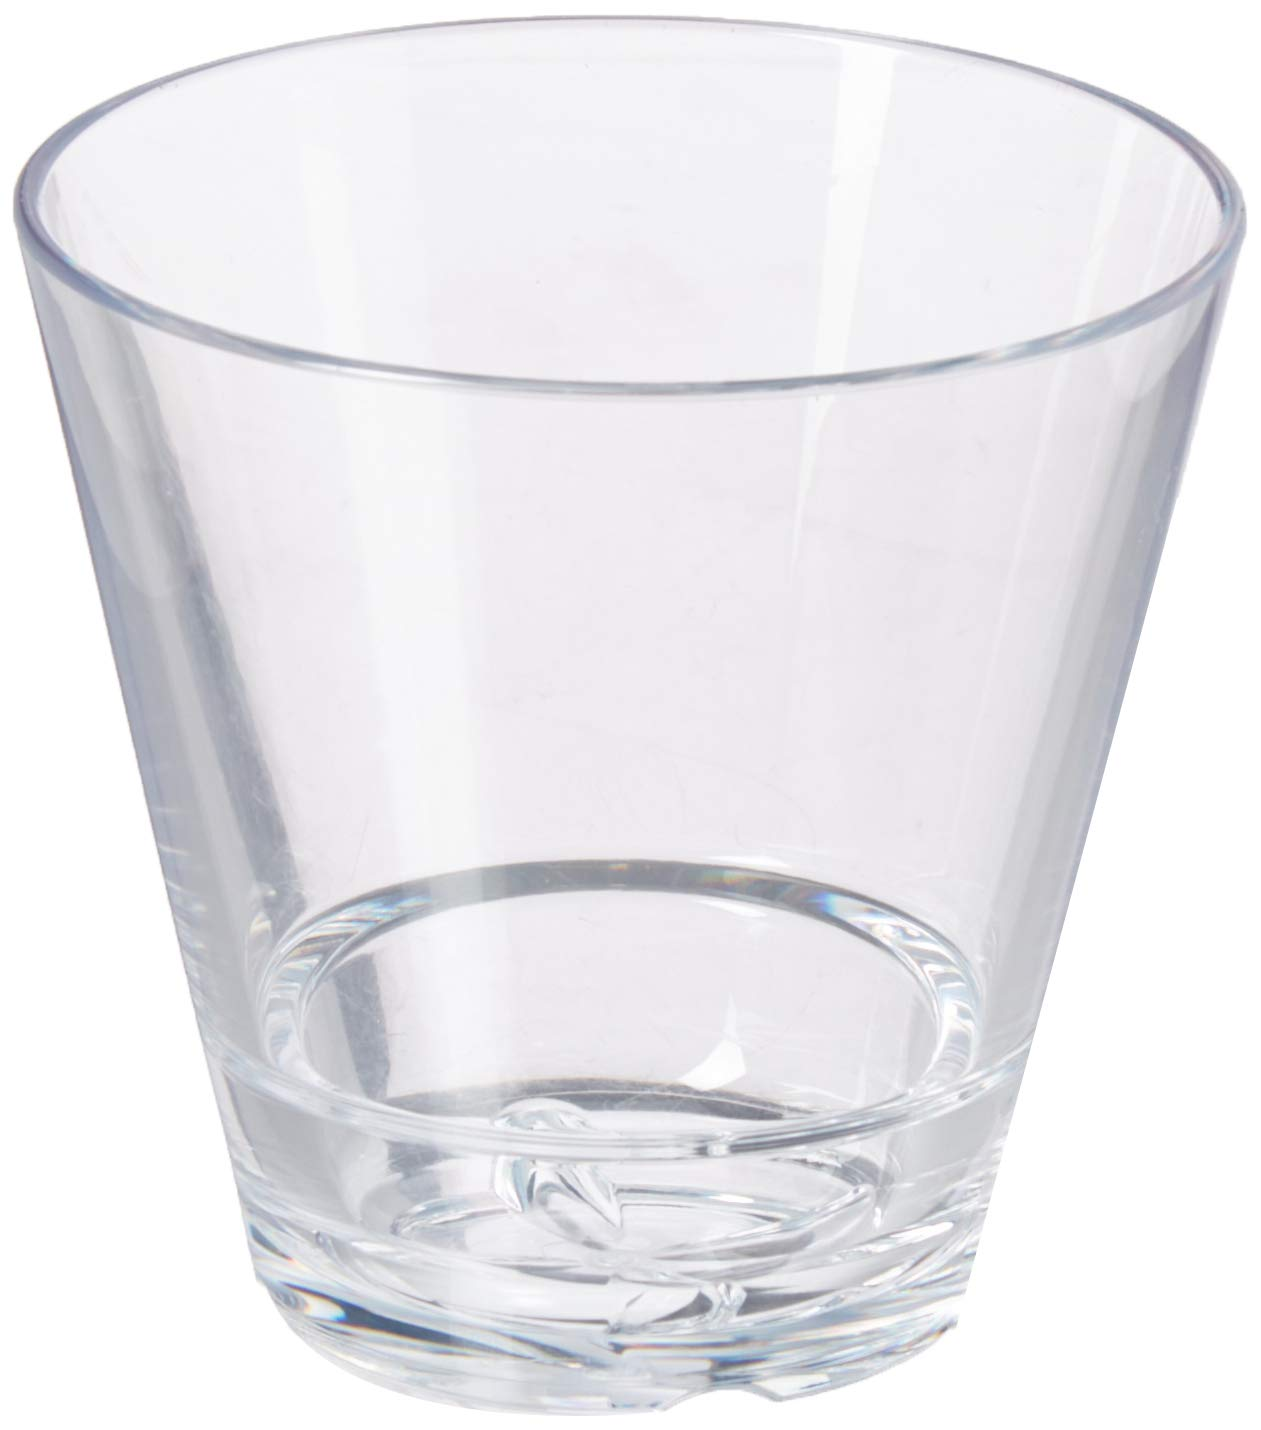 Drinique CAL-DR-CLR-24 Caliber Double Rocks Unbreakable Tritan Whiskey Glasses 12 oz (Case of 24) Clear